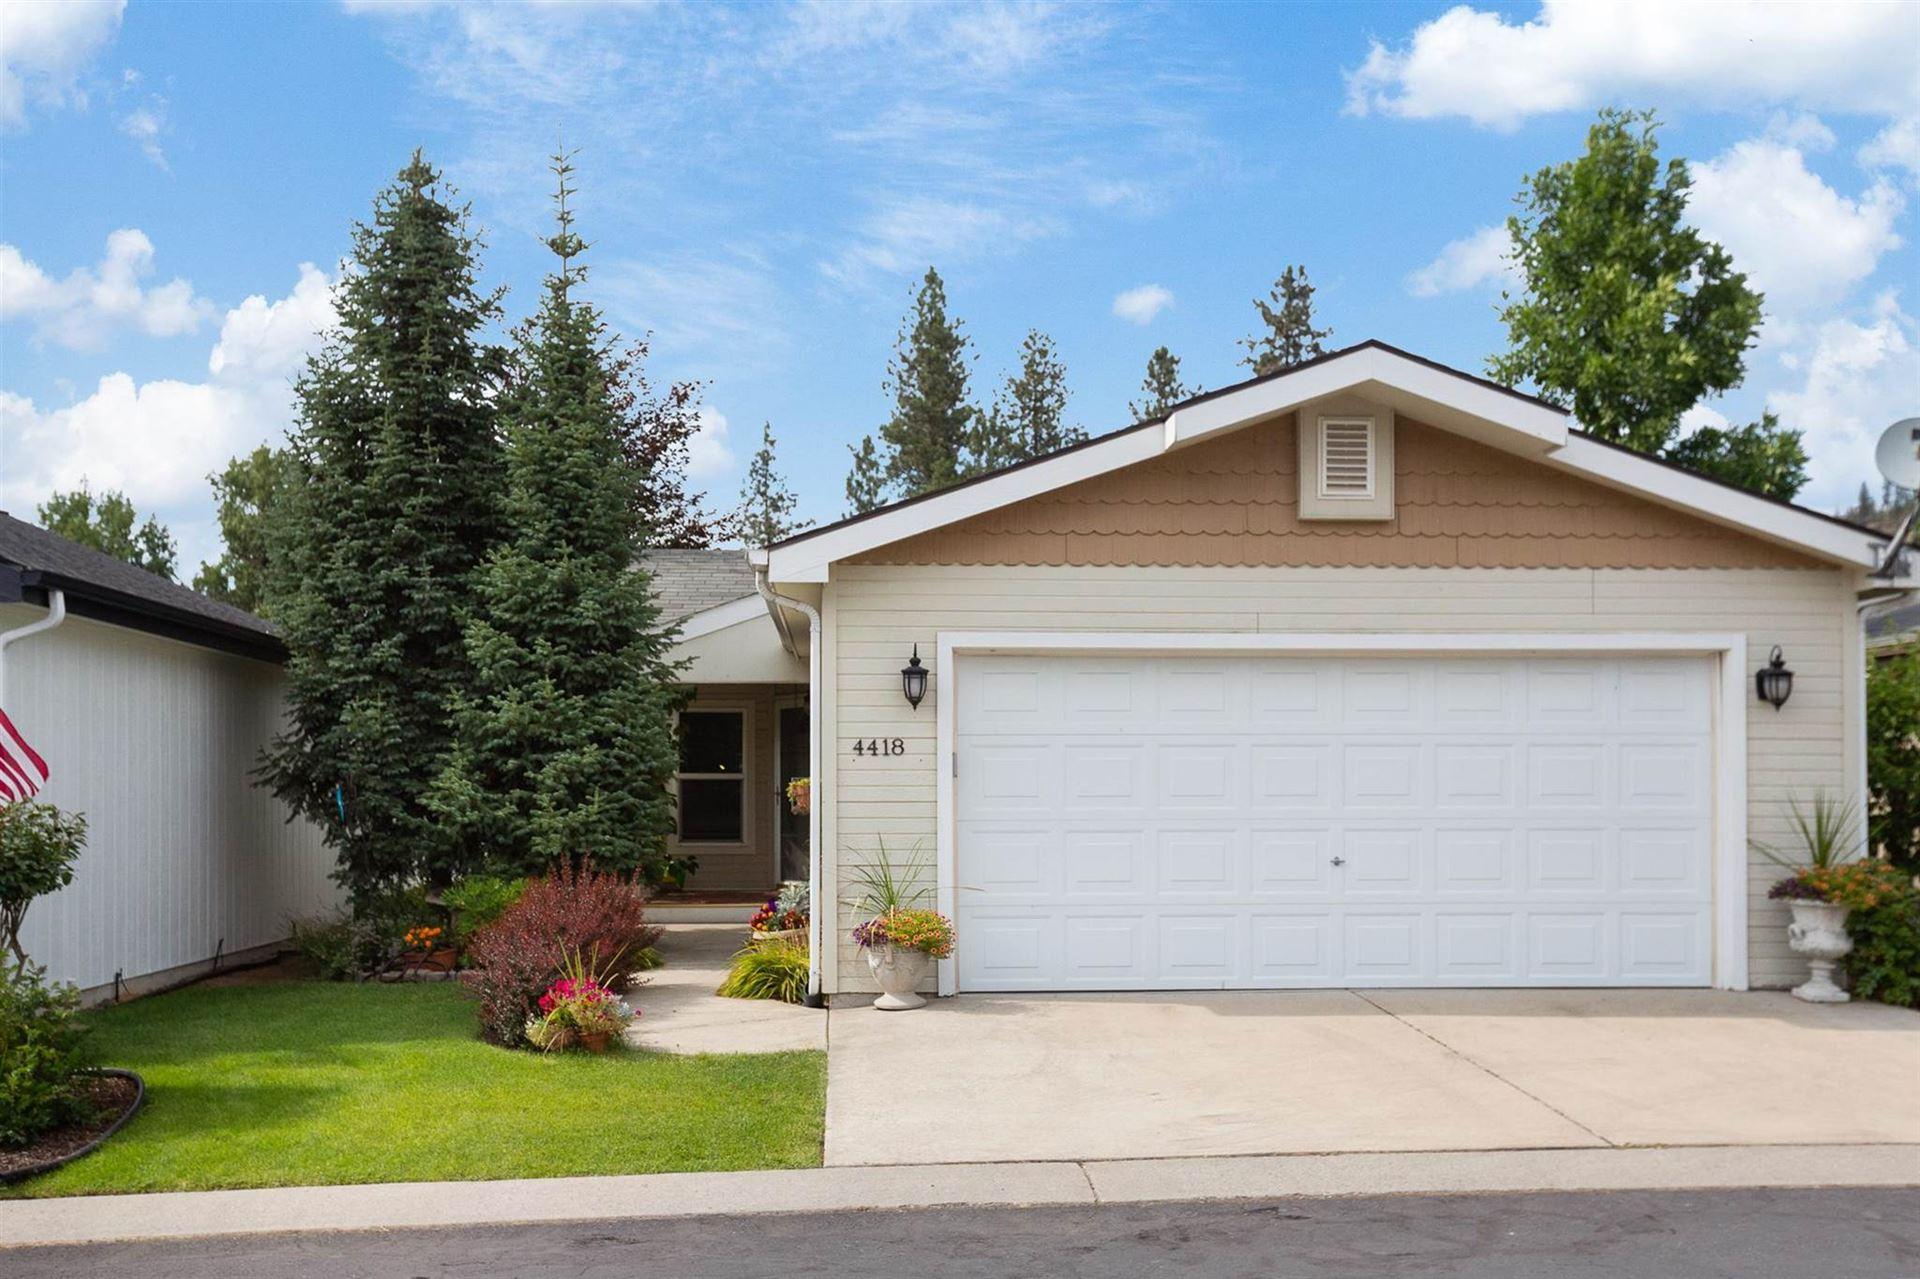 4418 S Sunny Creek Cir, Spokane, WA 99224 - #: 202119872